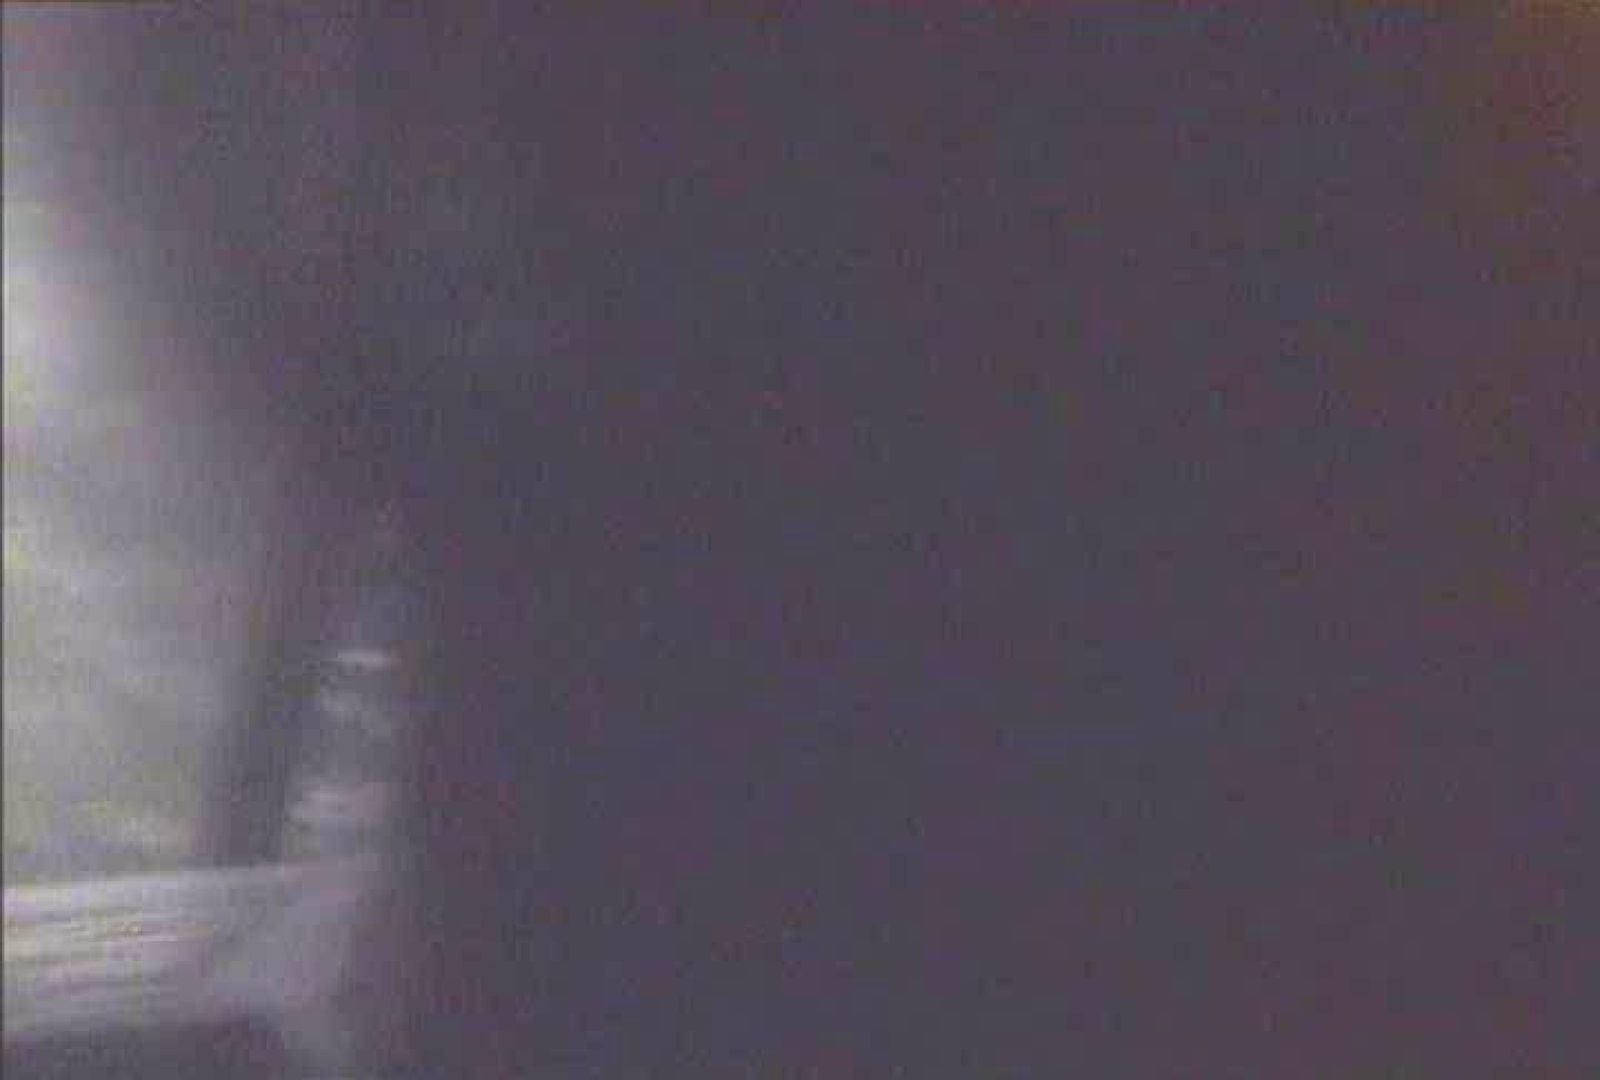 素人投稿シリーズ 盗撮 覗きの穴場 大浴場編  Vol.2 OL女体 濡れ場動画紹介 91連発 67